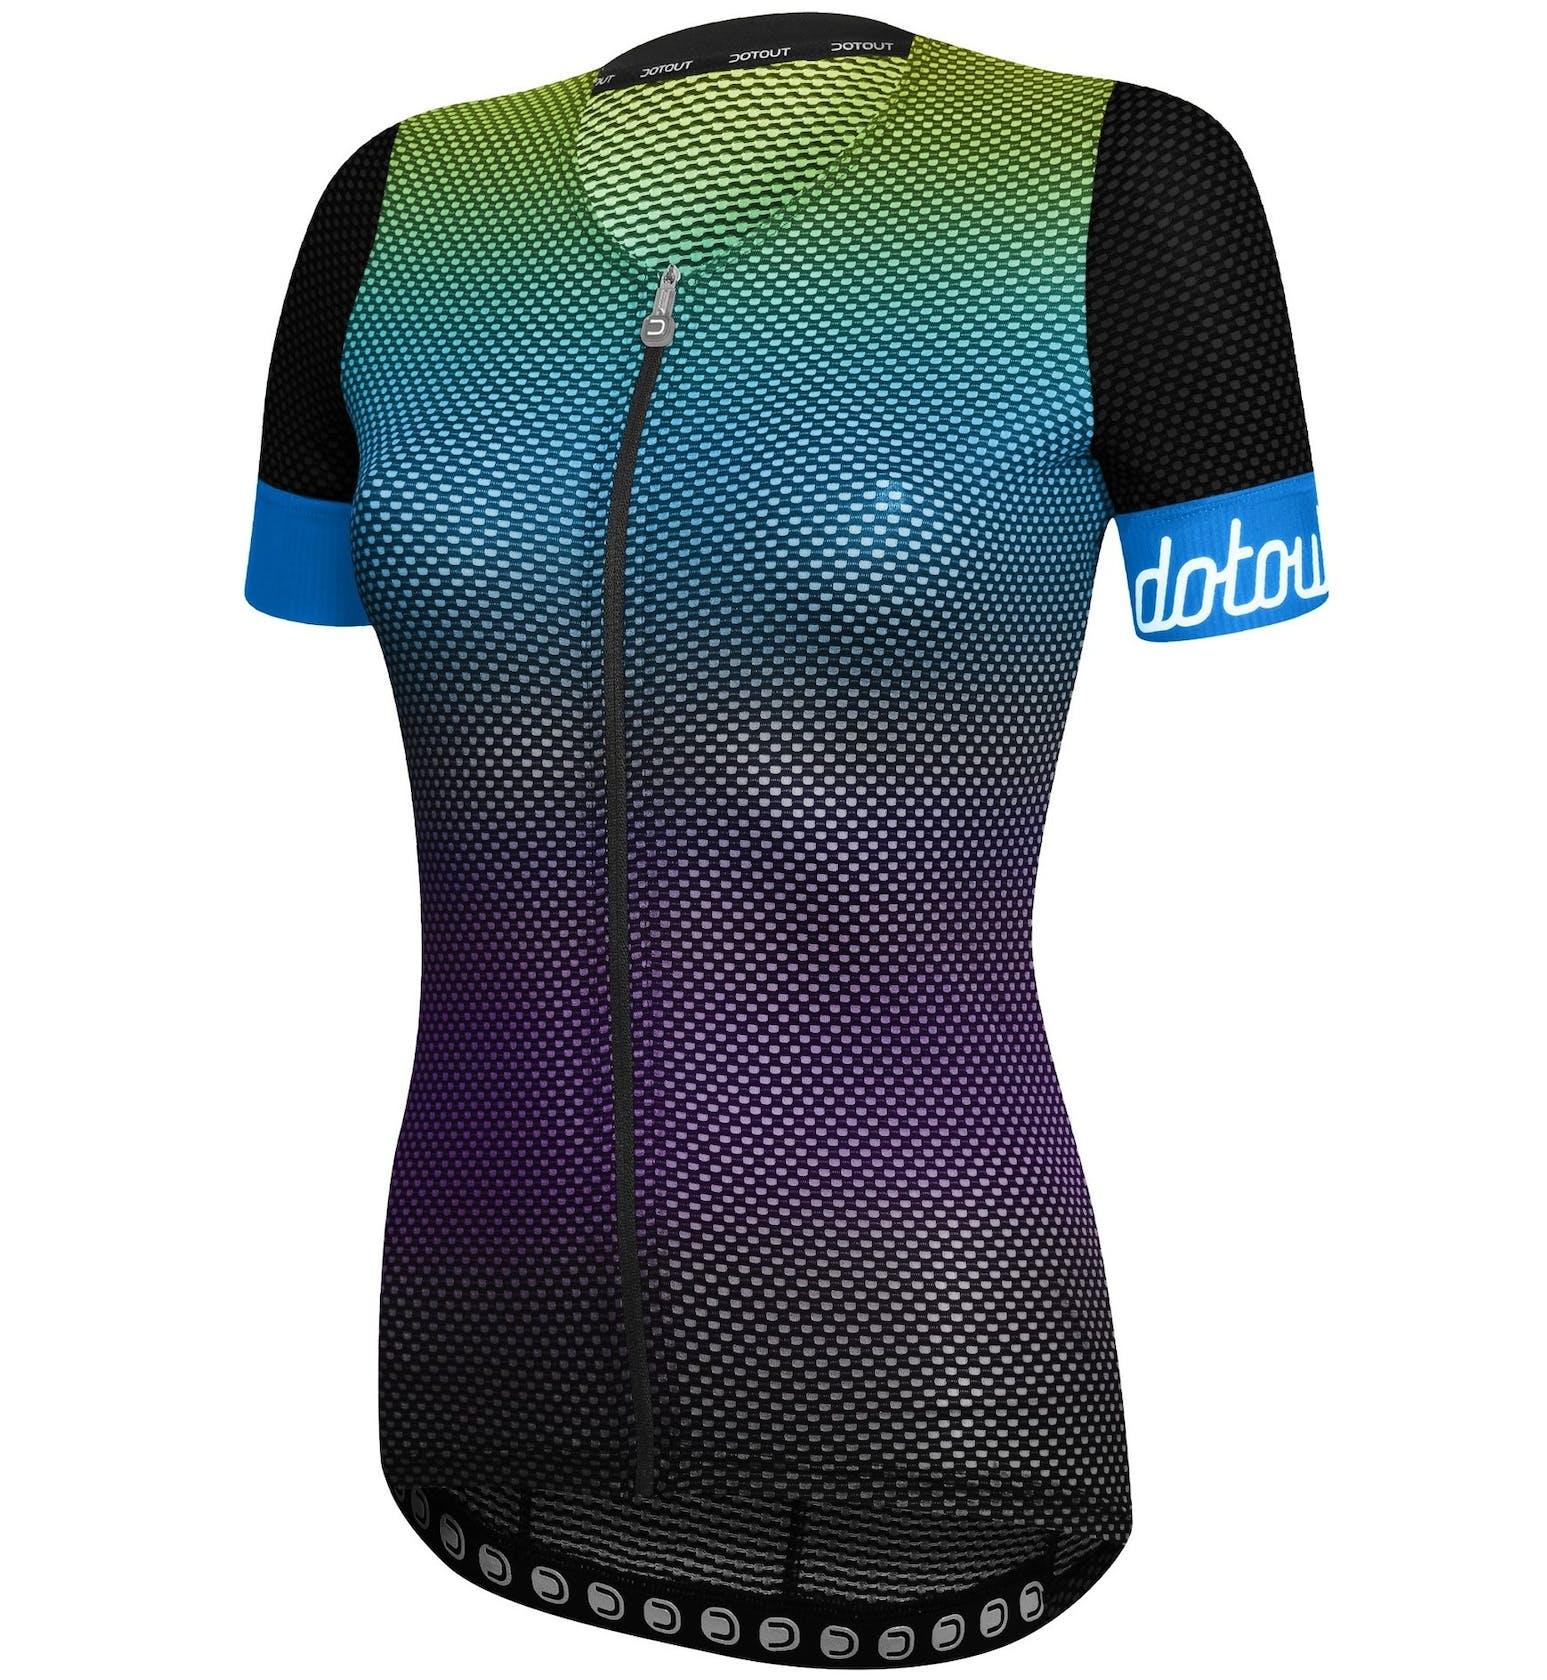 Dotout Glory - maglia bici - donna